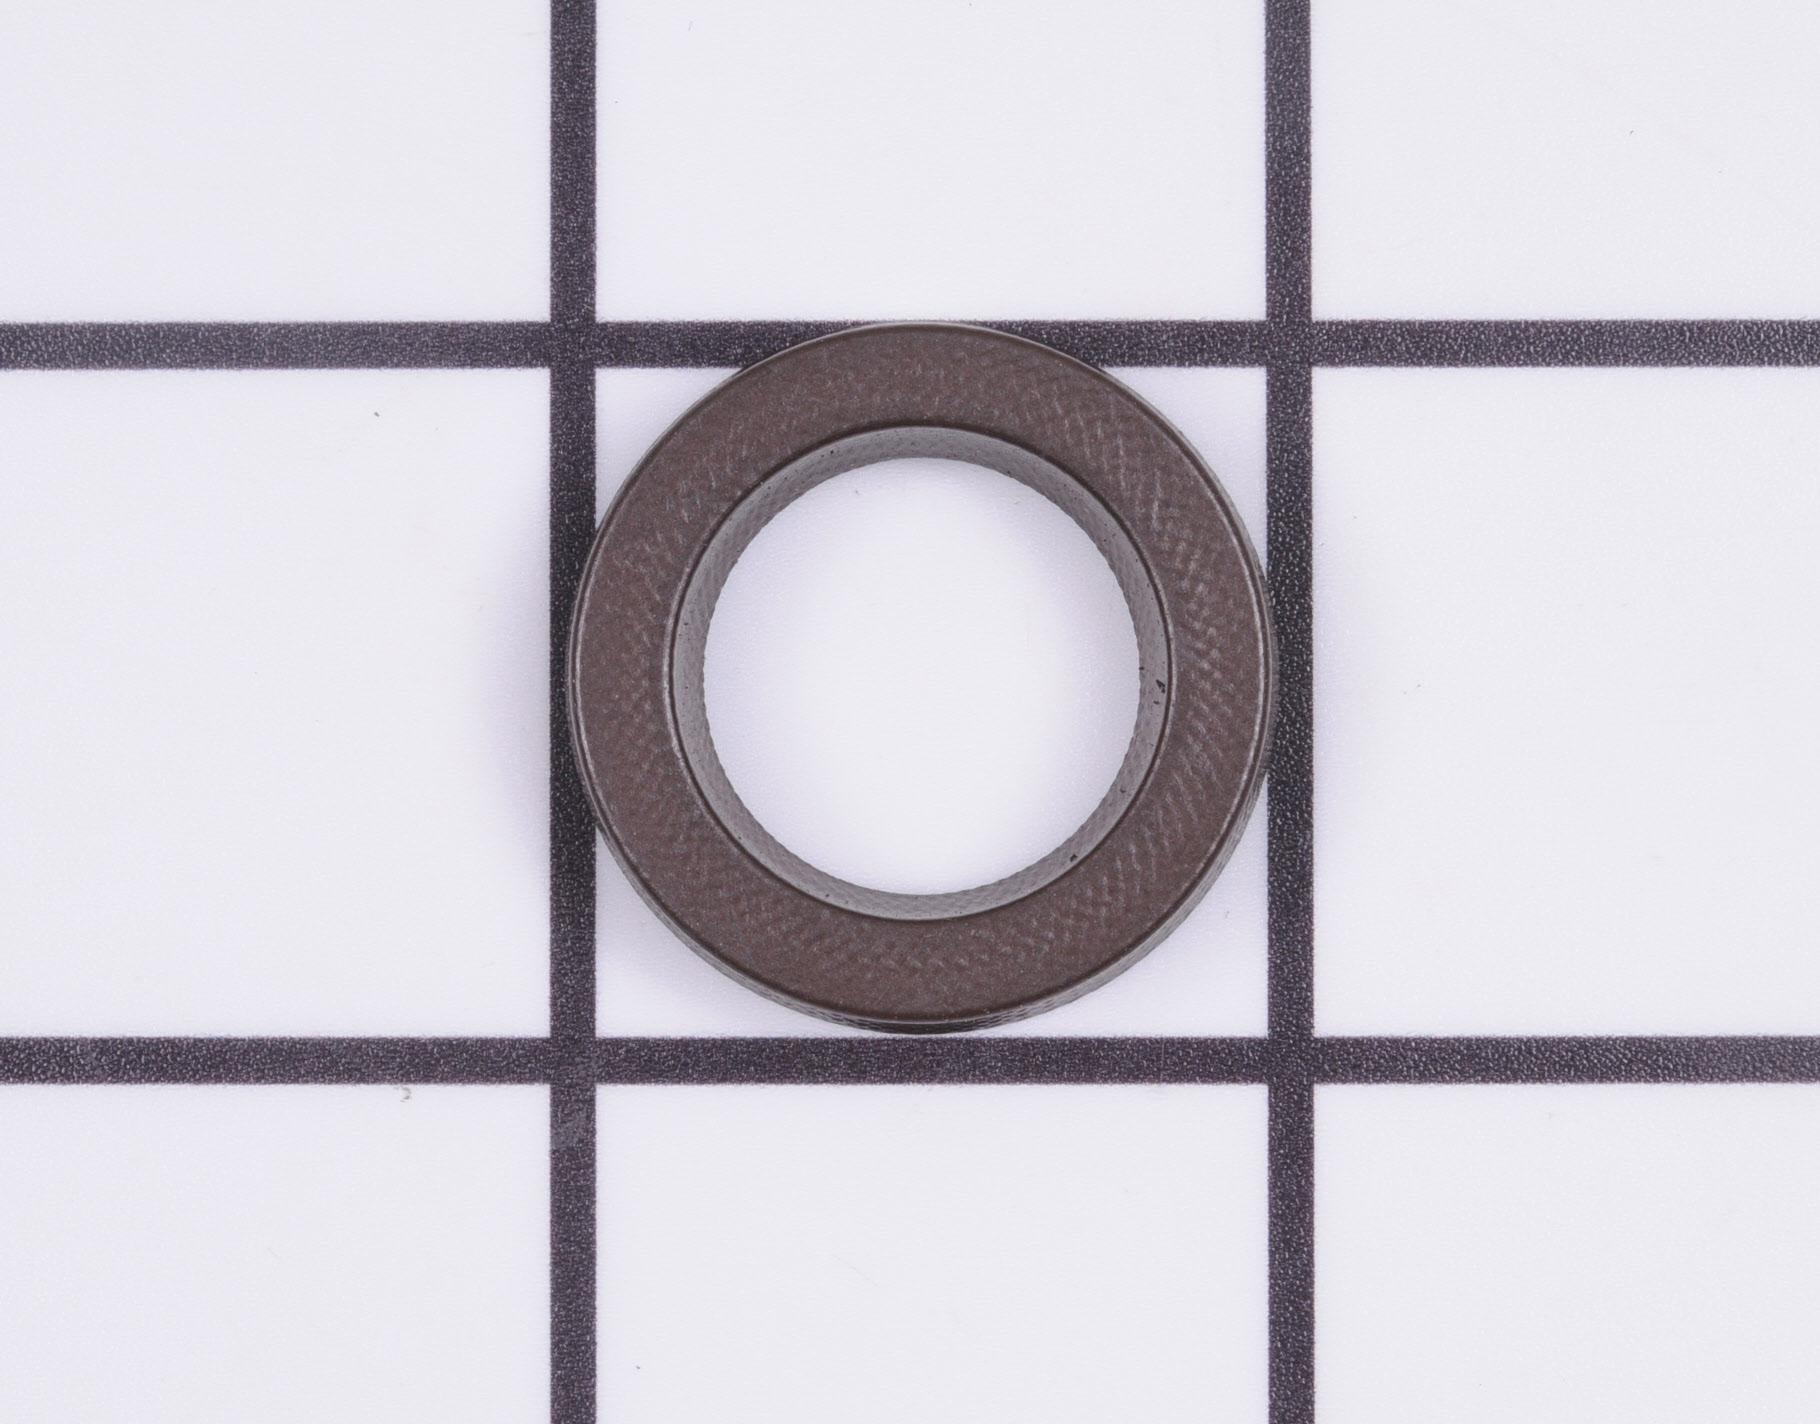 Pressure Washer Part #  - Seal - Karcher 6.365-408.0